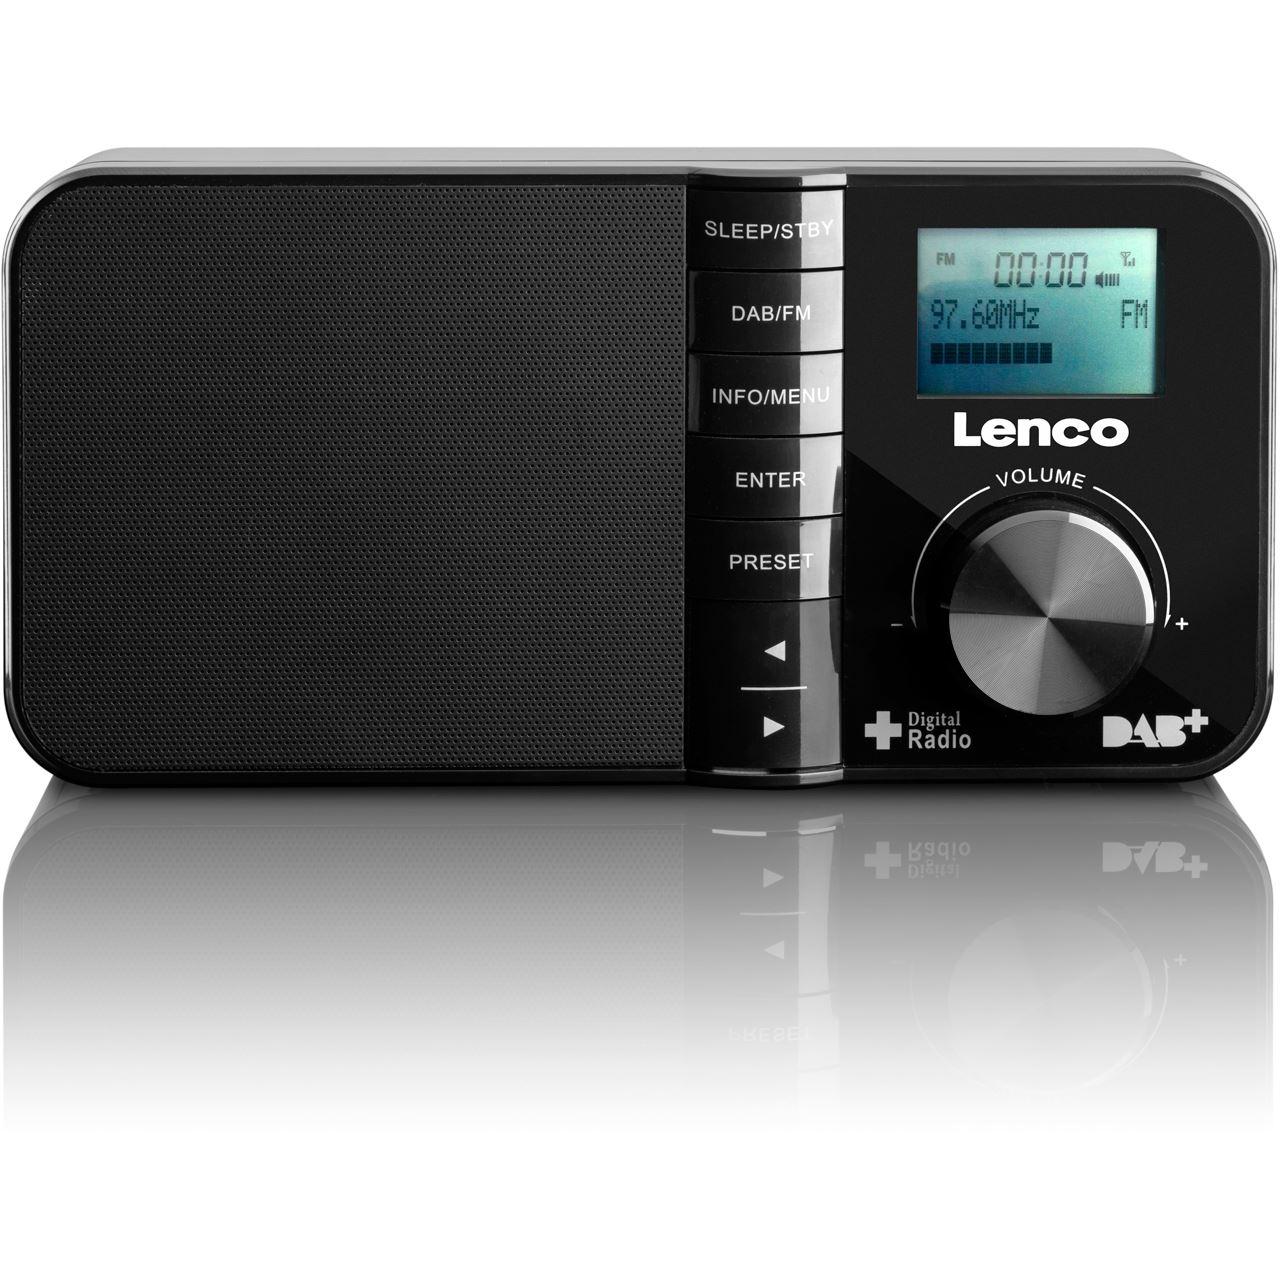 lenco pdr 03 dab radio mit lcd display radios. Black Bedroom Furniture Sets. Home Design Ideas